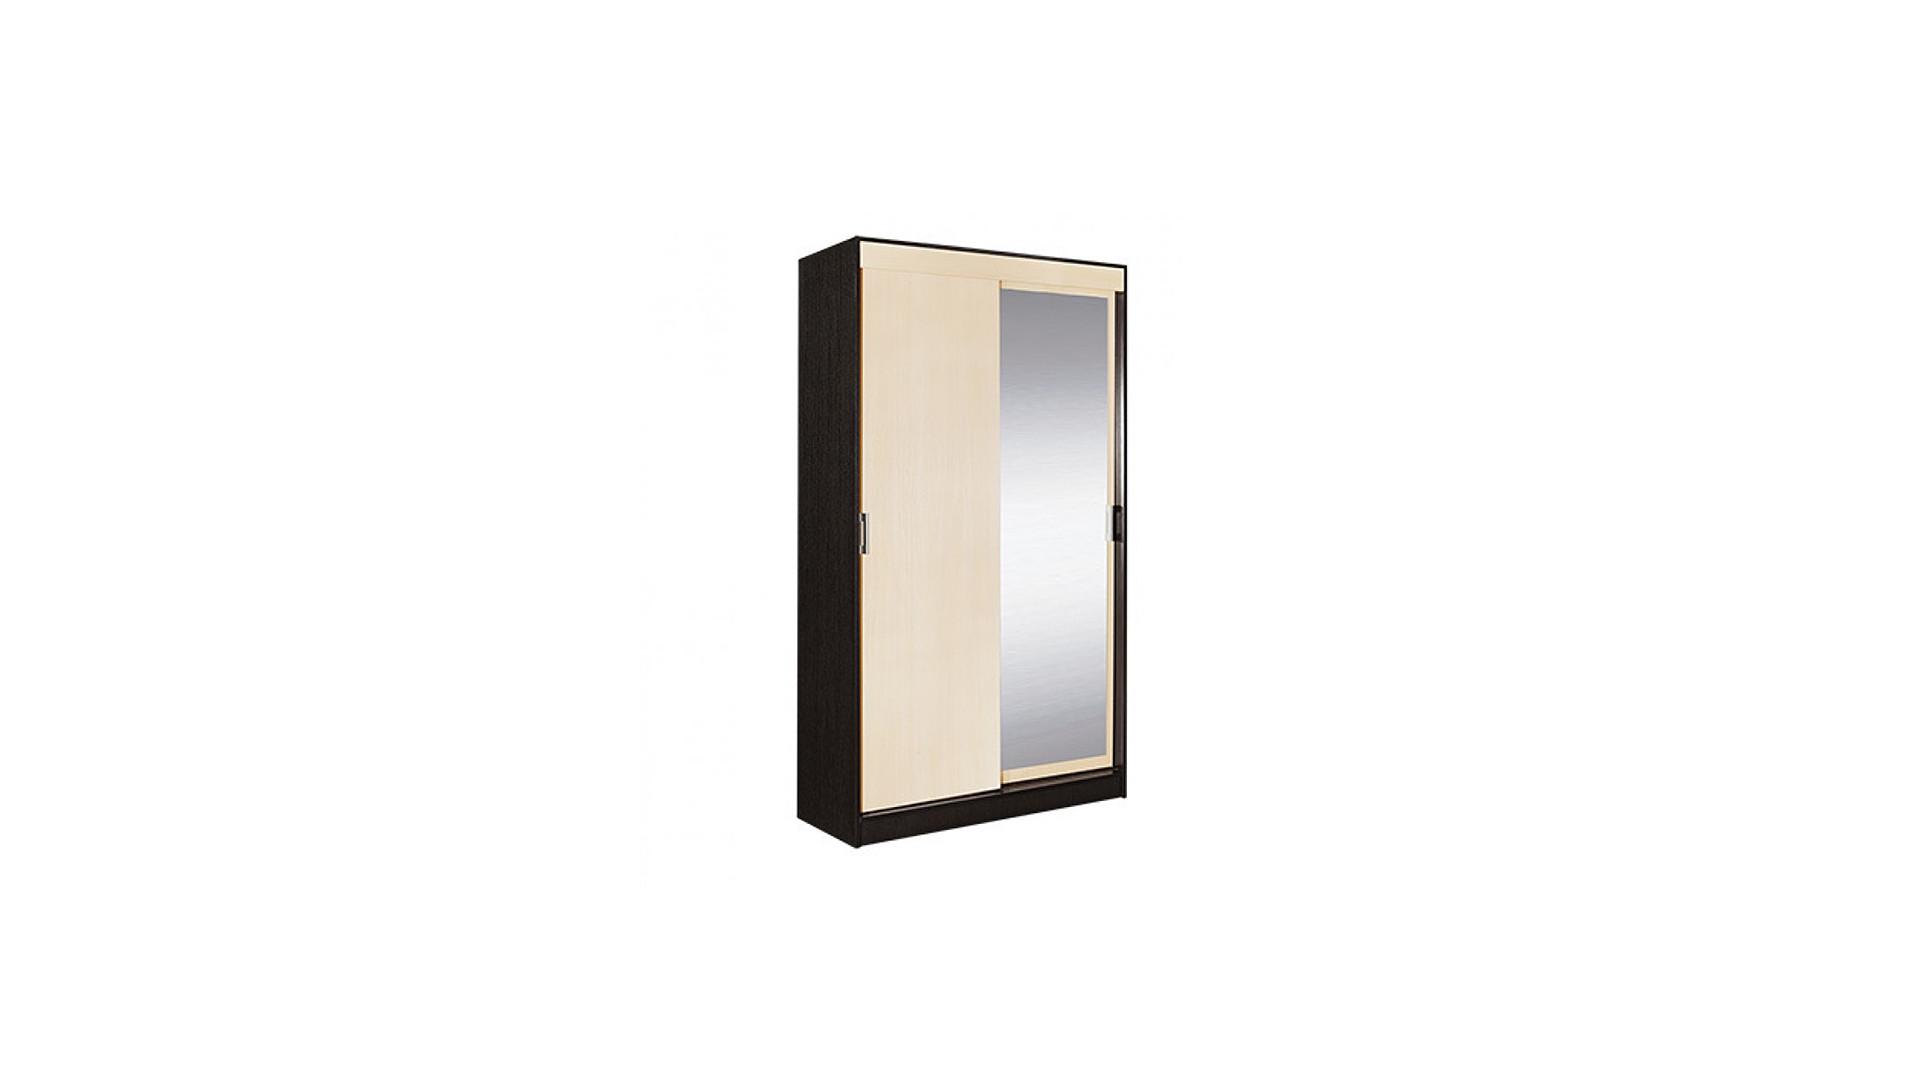 Шкаф-купе 2-х створчатый с 1 зеркалом Светлана Венге/Дуб молочный